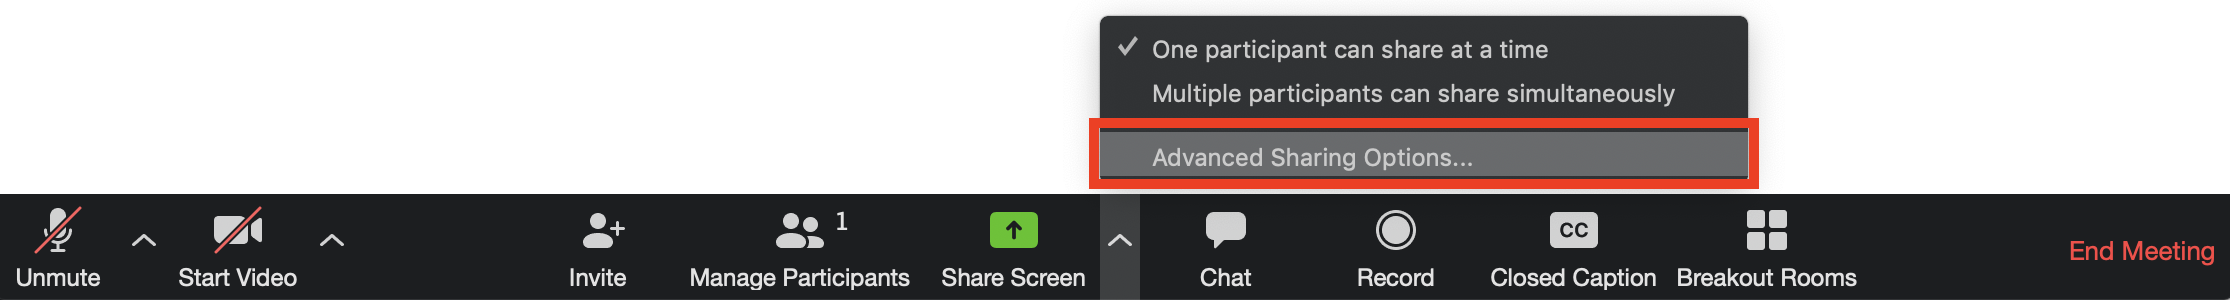 Screensot of Zoom toolbar displaying 'Advanced Sharing Options' selected